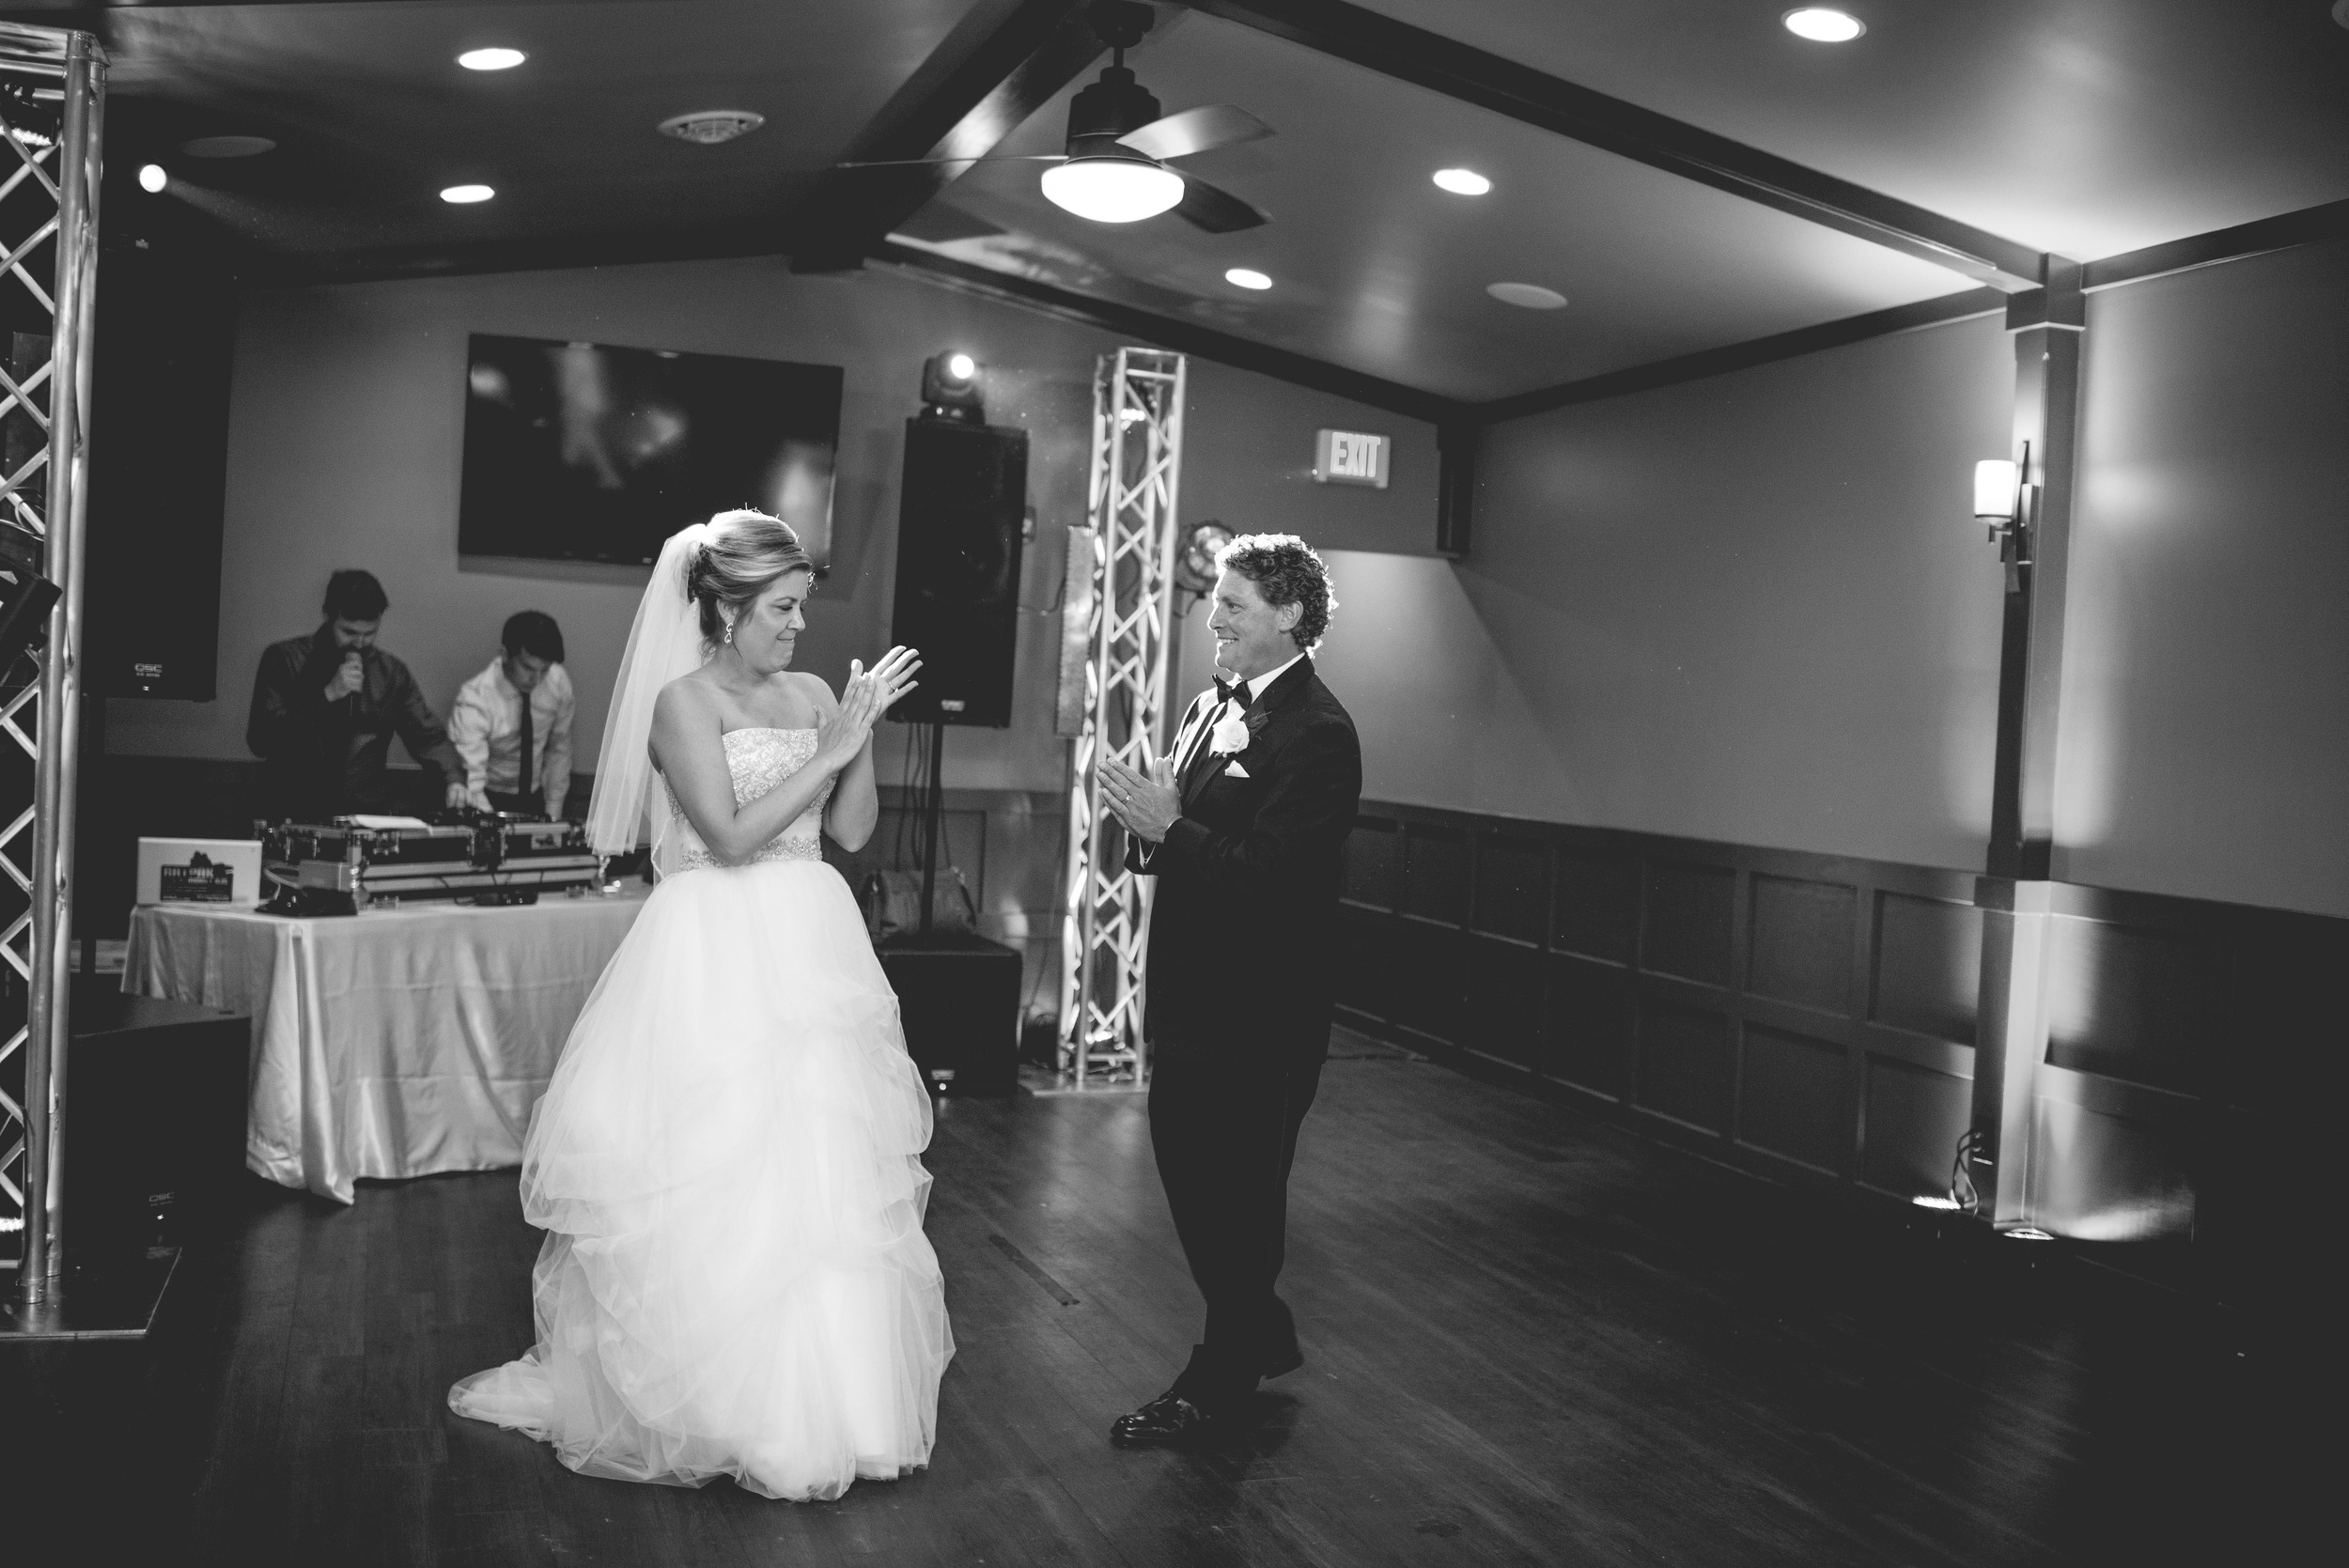 sarasutterphotography_leeandshalon_wedding_2015-677.jpg